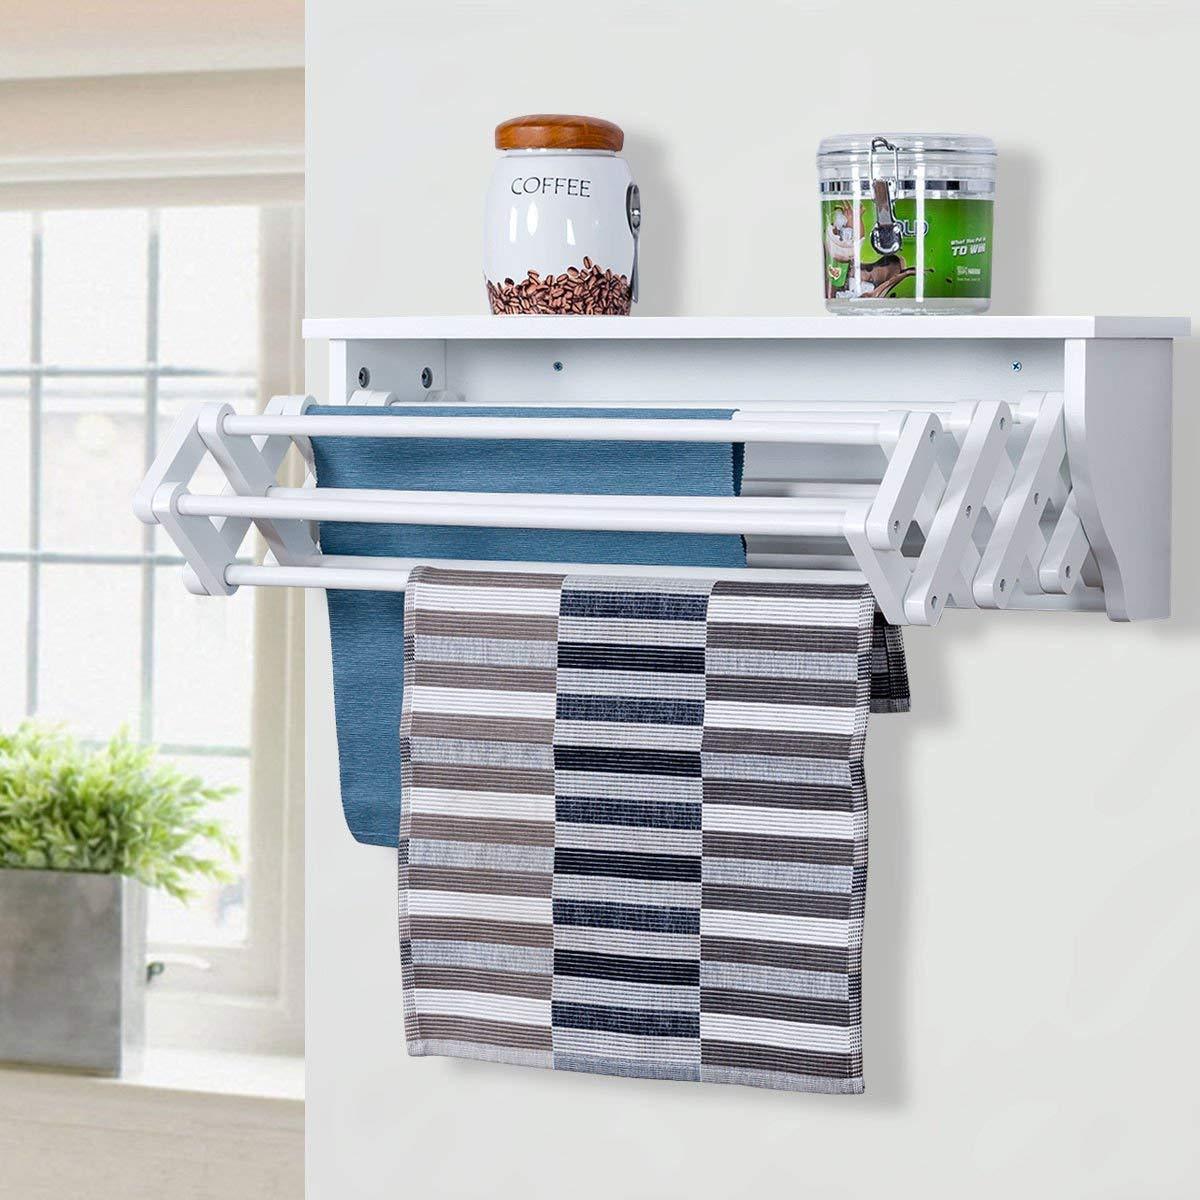 TANGKULA Wall Mount Drying Rack Bathroom Home Expandable Towel Rack Drying Laudry Hanger Clothes Rack (Wood) by TANGKULA (Image #2)